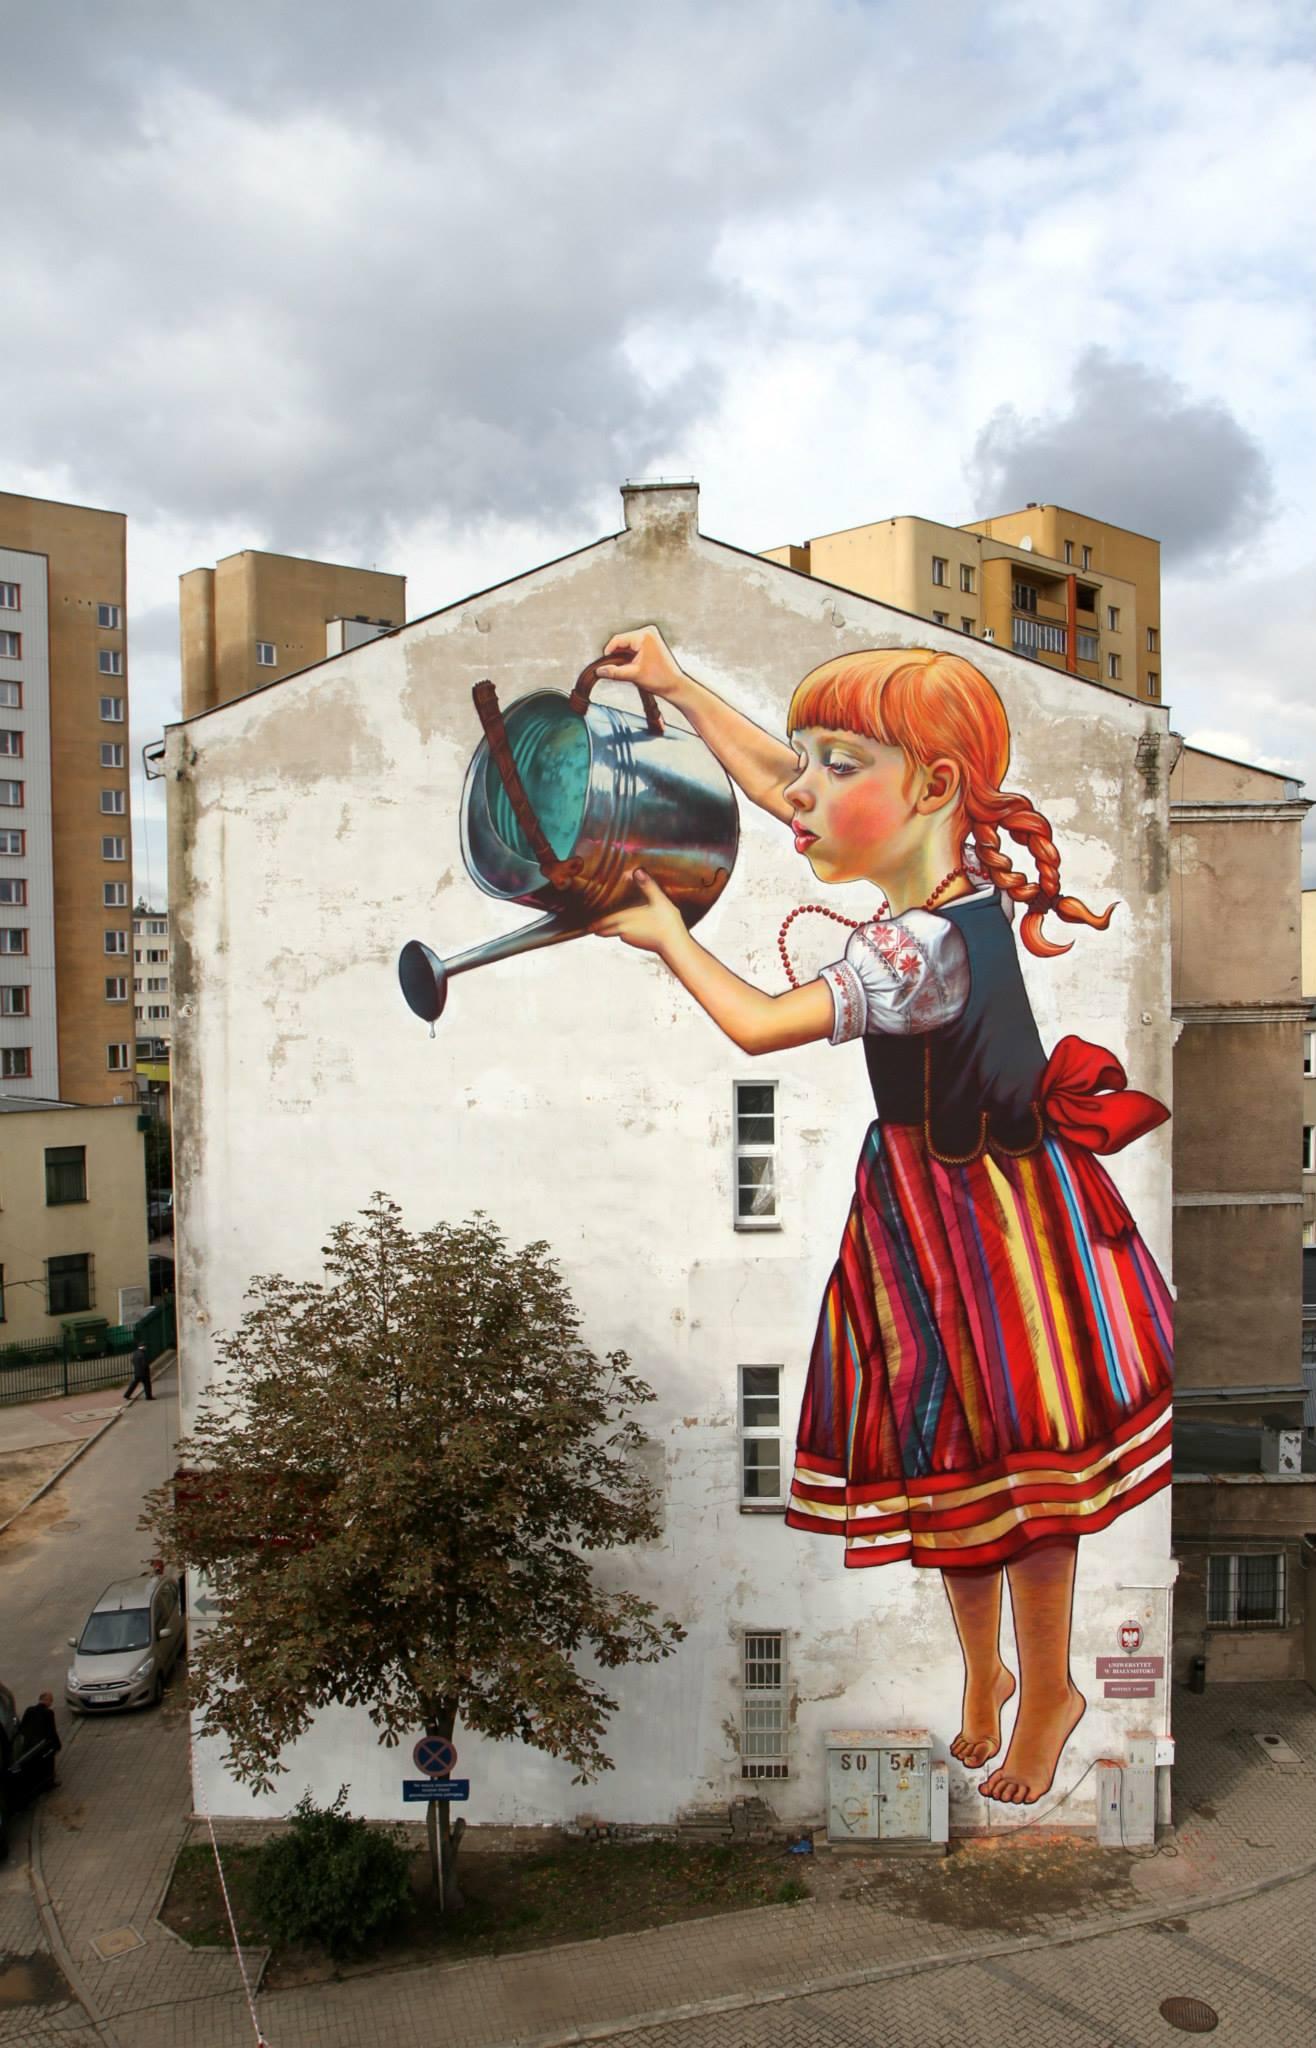 Mural-by-Natalii-Rak-at-Folk-on-the-Street-in-Biaymstoku-Poland-3